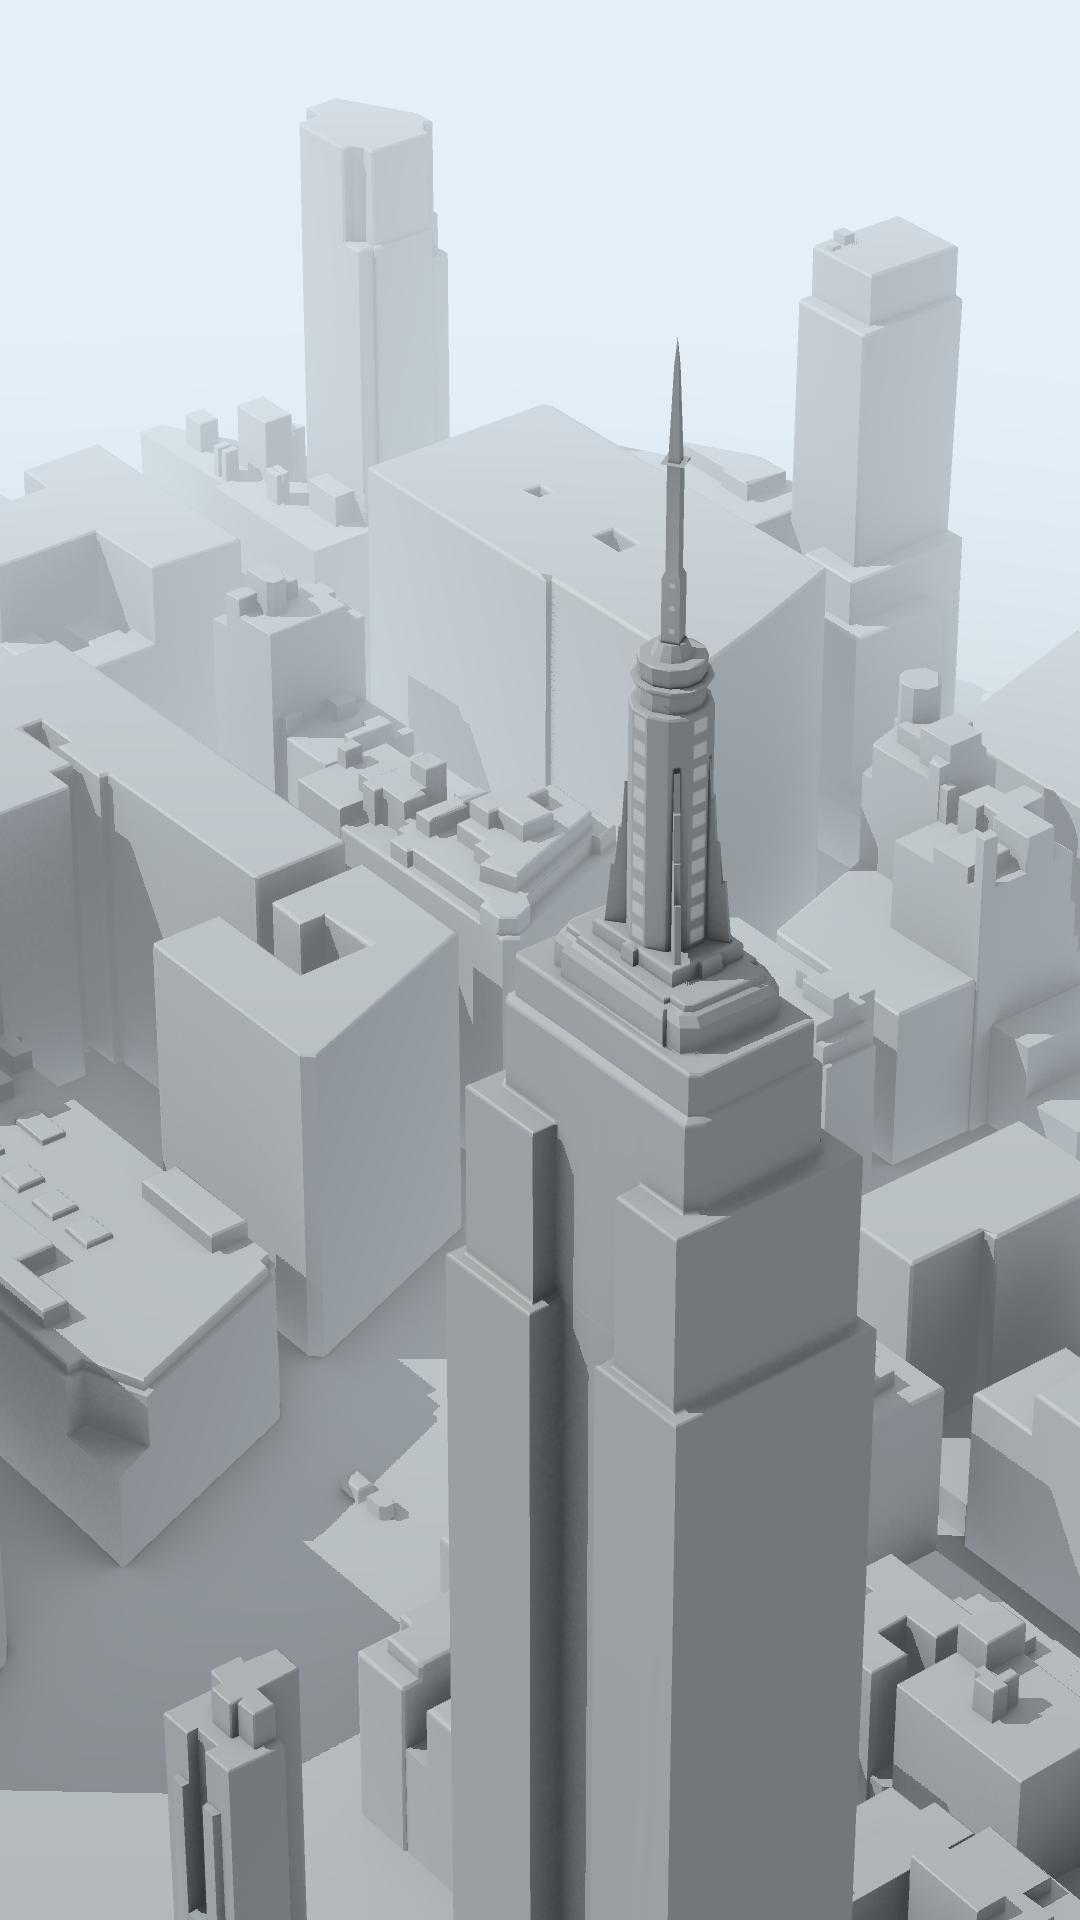 Download Pixel 3 Stock Wallpapers & Live Wallpapers